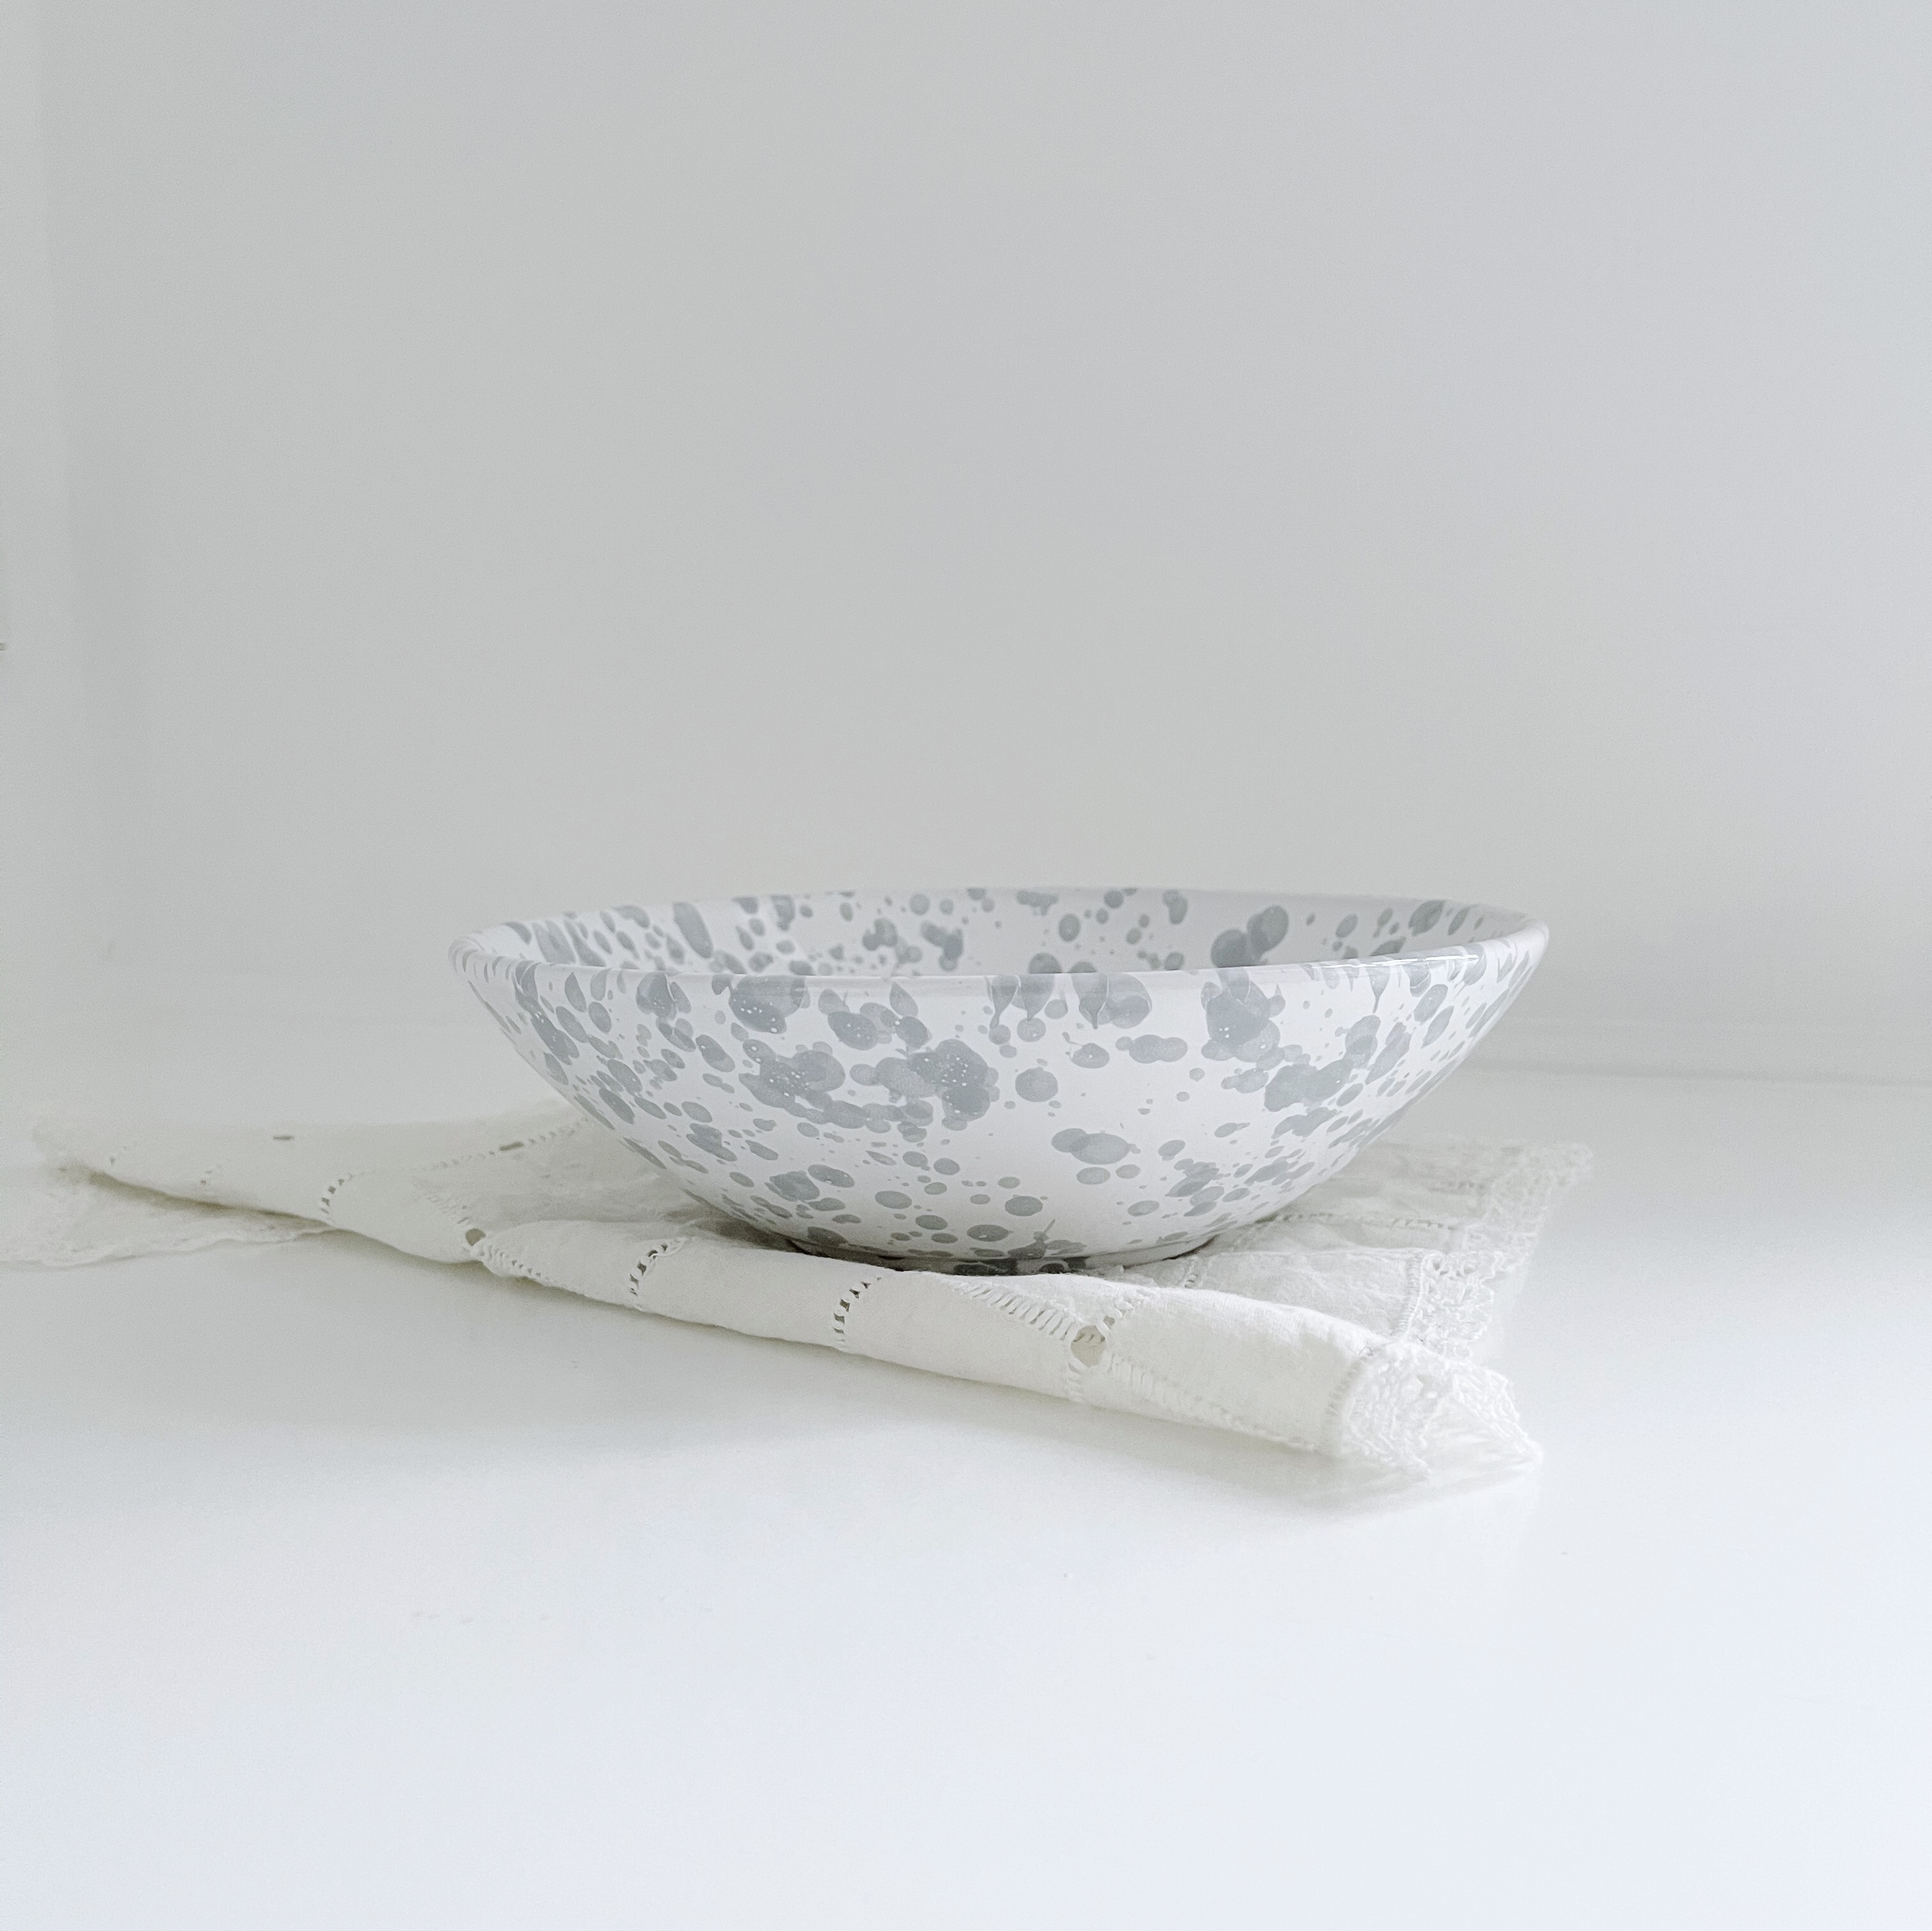 Nicola Fasano / Skål 23 cm